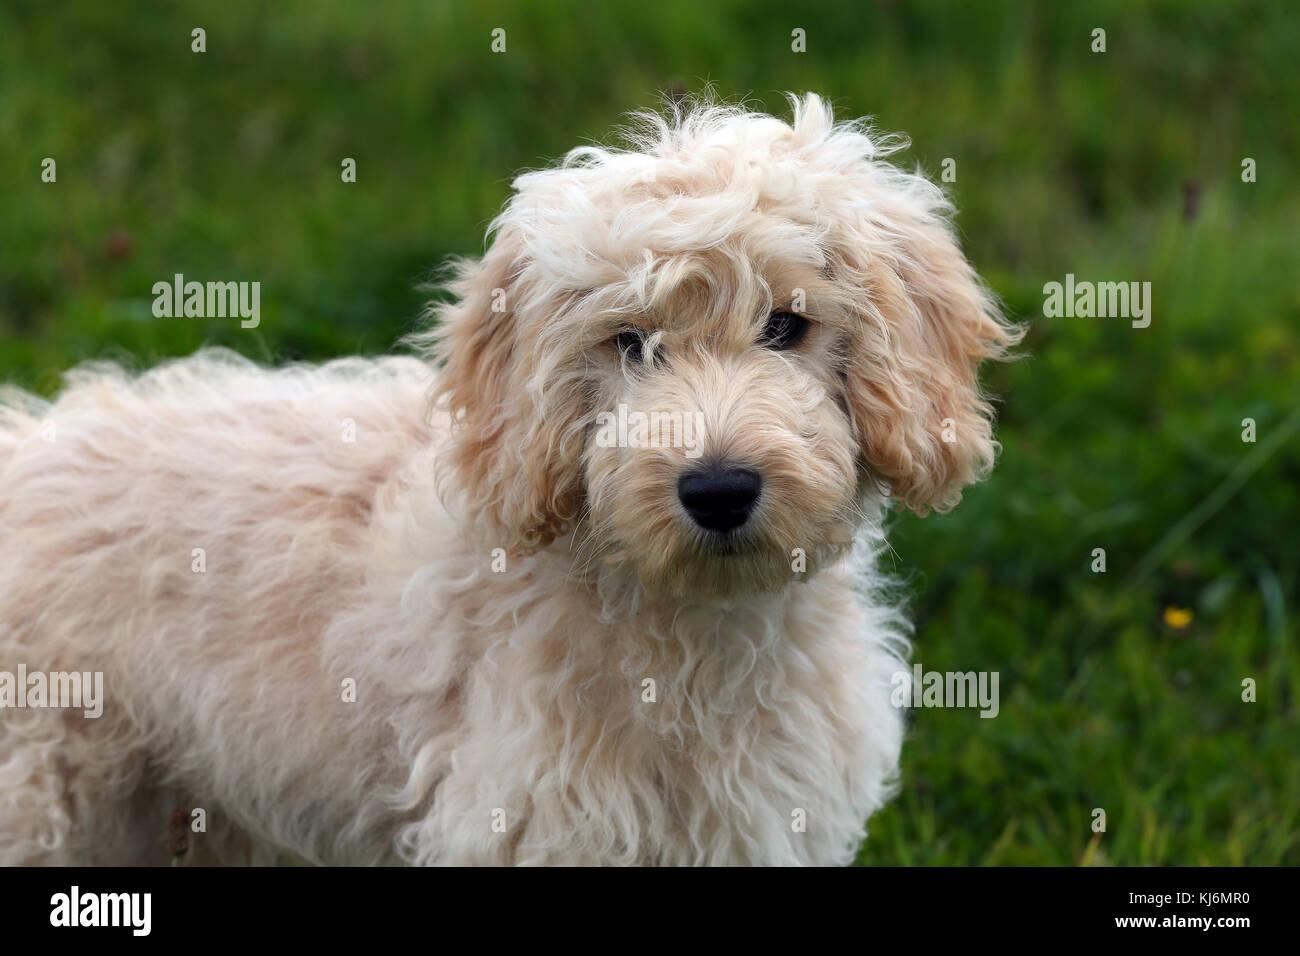 Cockerpoo Puppy - Stock Image